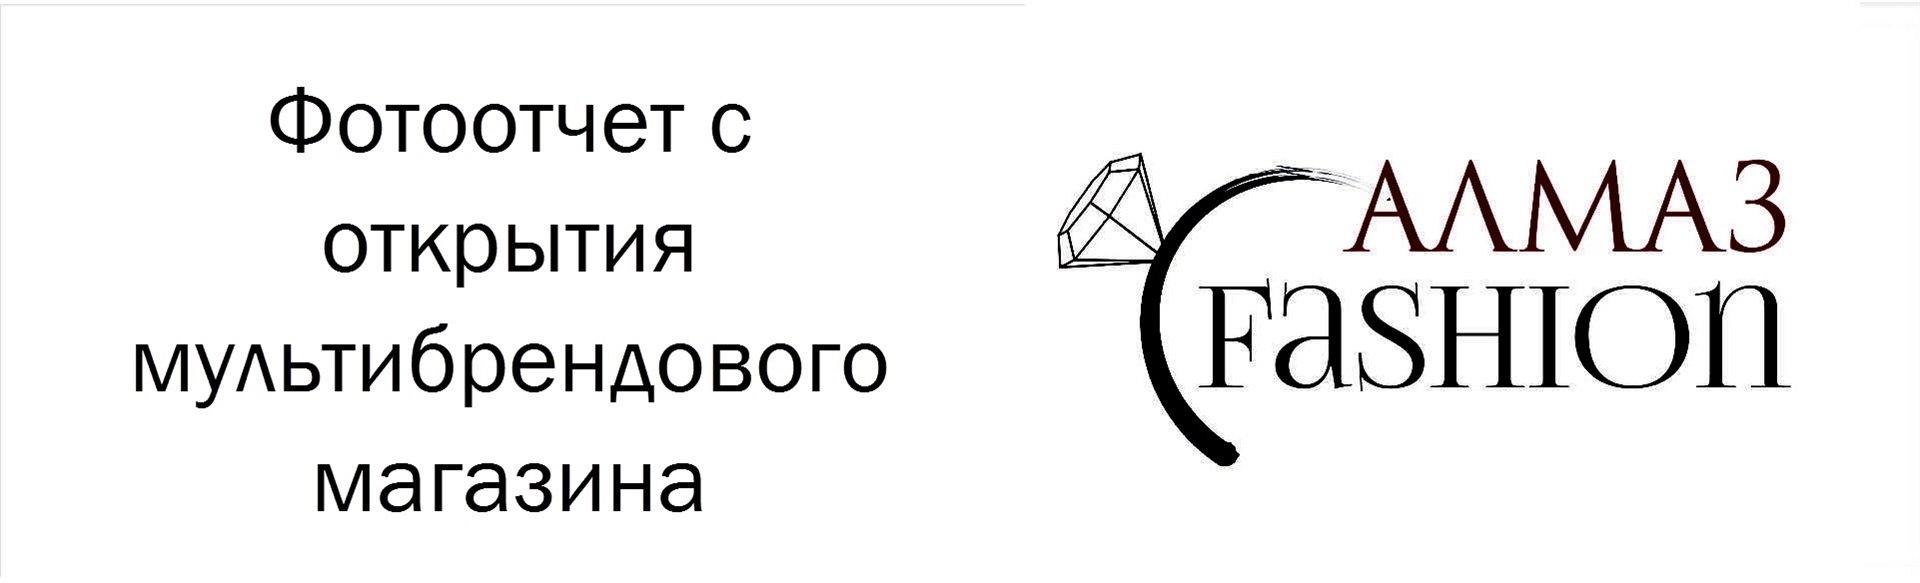 https://www.almazcom.ru/pub/img/QA/projects/banner_den_goroda_na_sajt.jpg